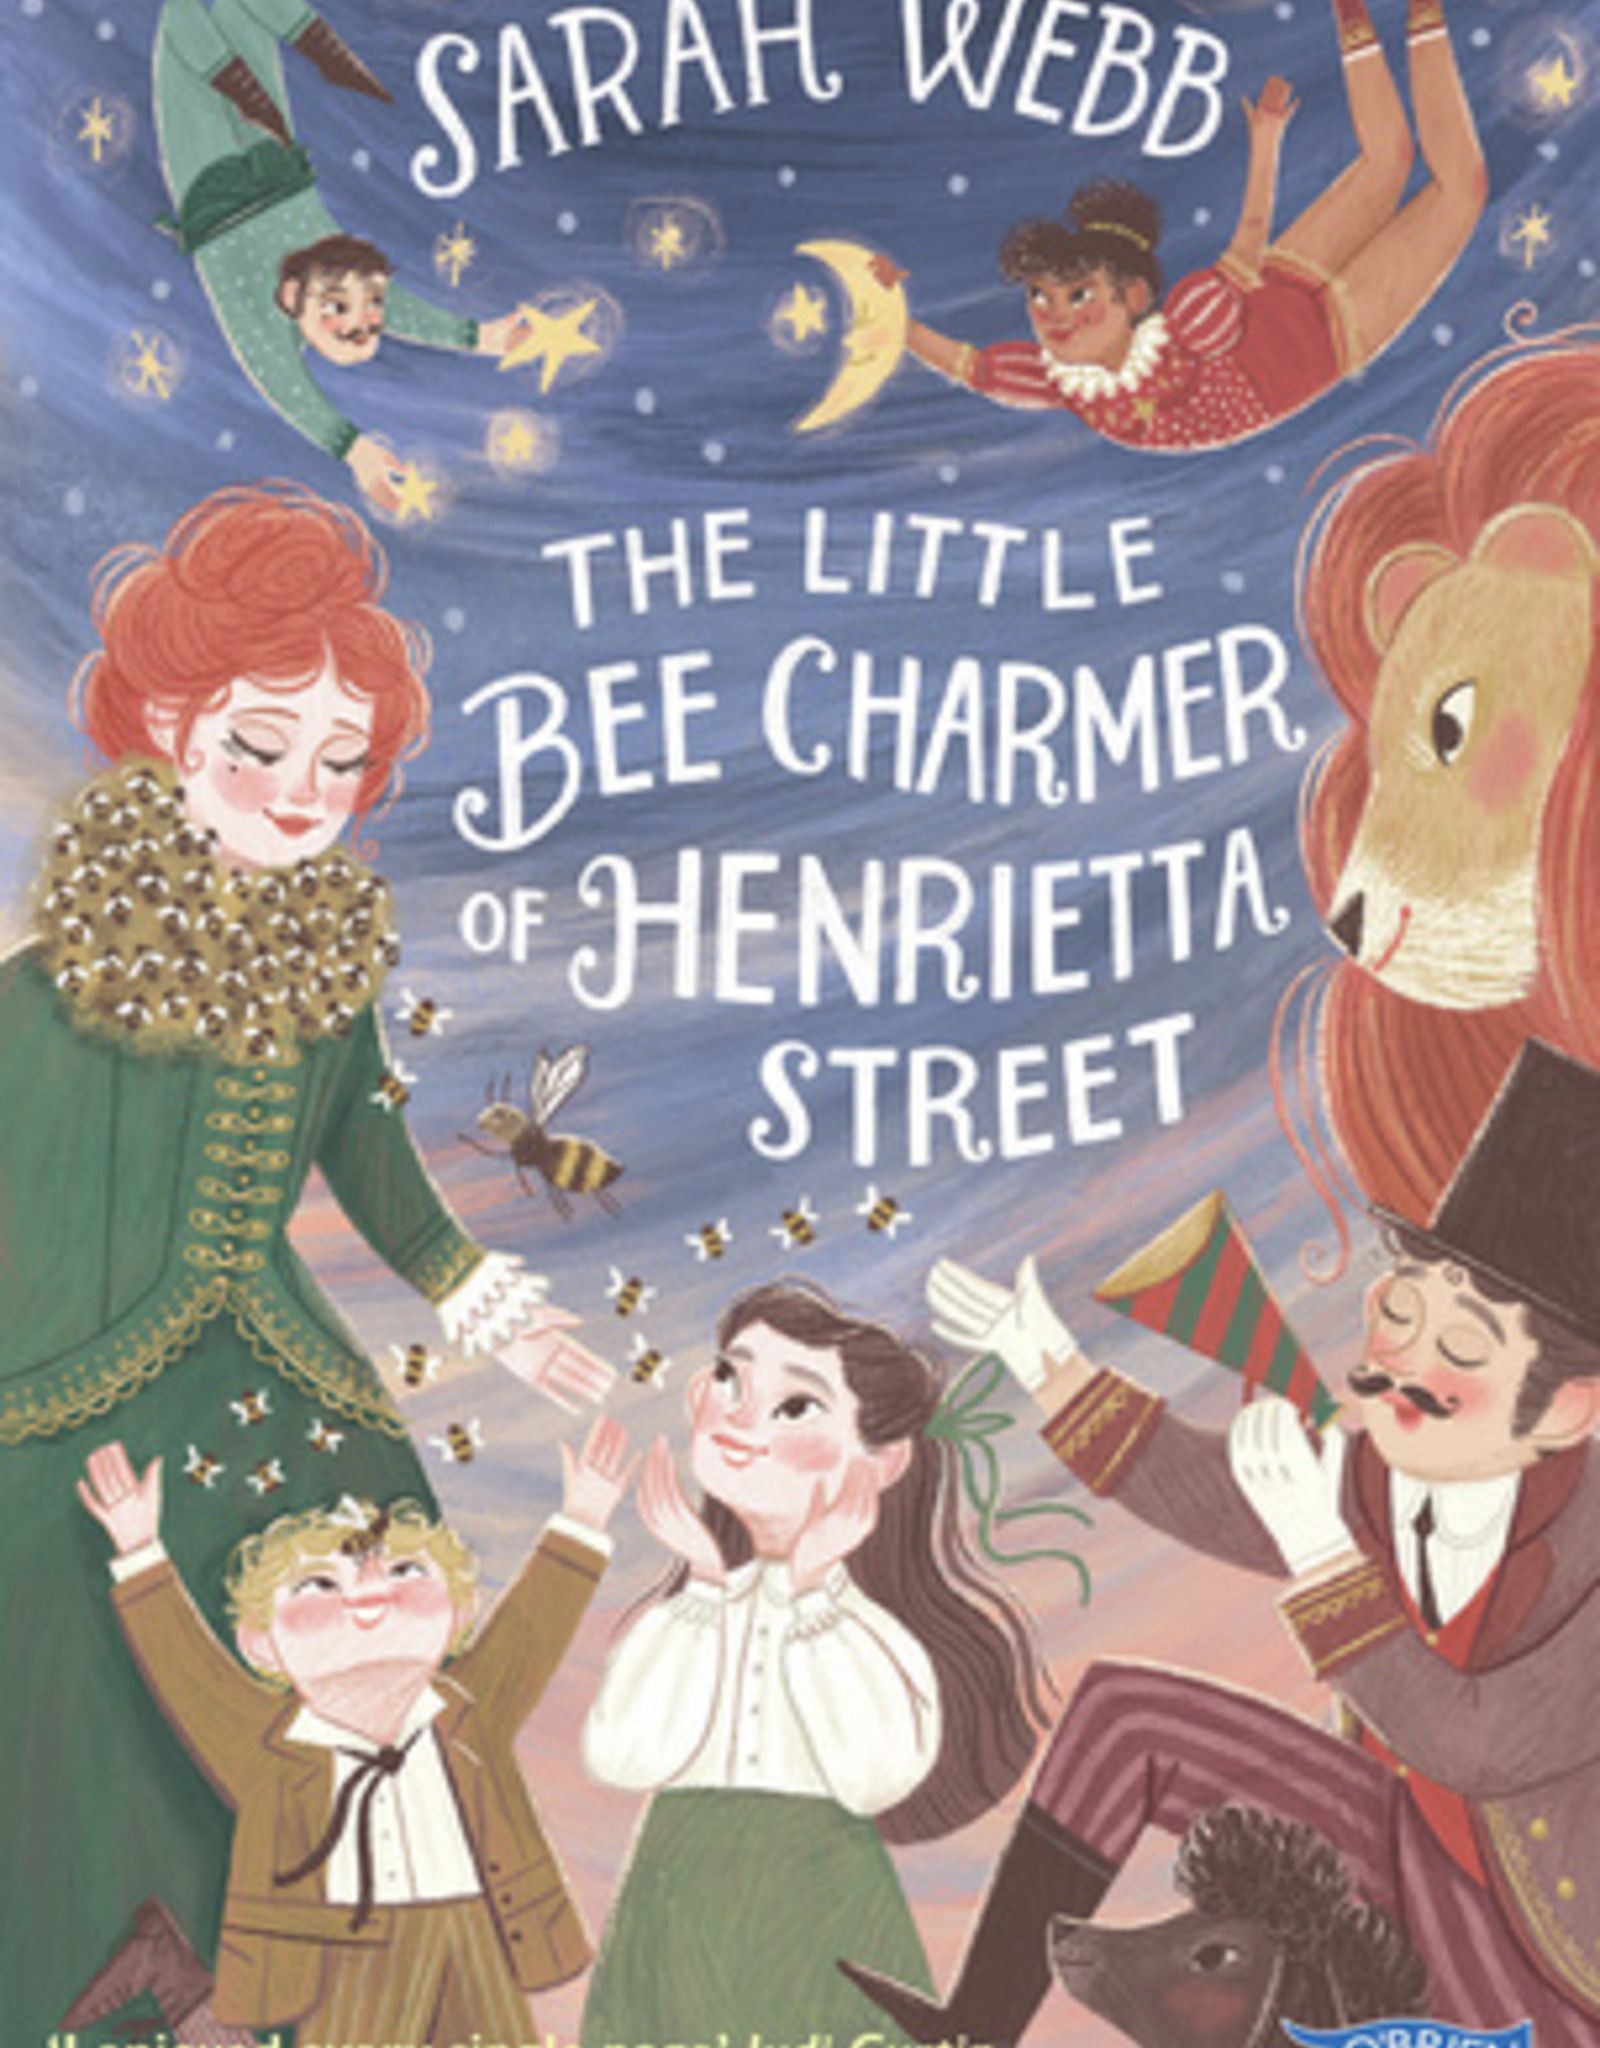 Little Bee Charmer of Henrietta Street